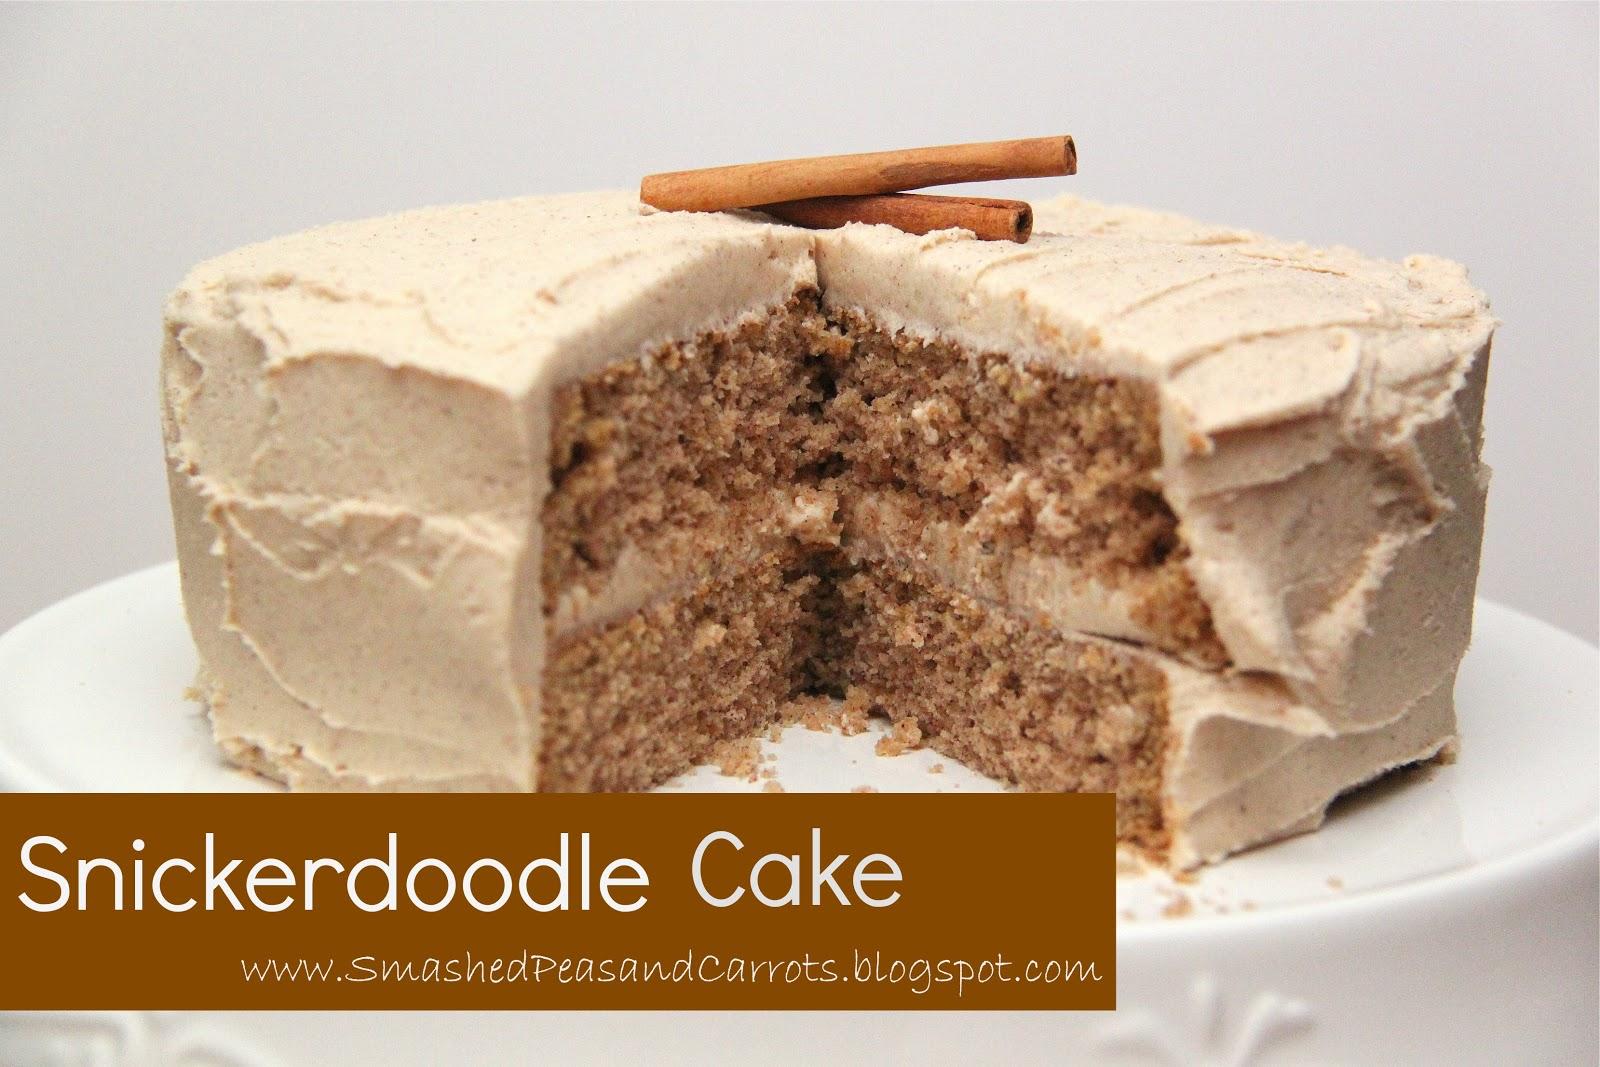 Snickerdoodle Cake Recipe Cake Mix